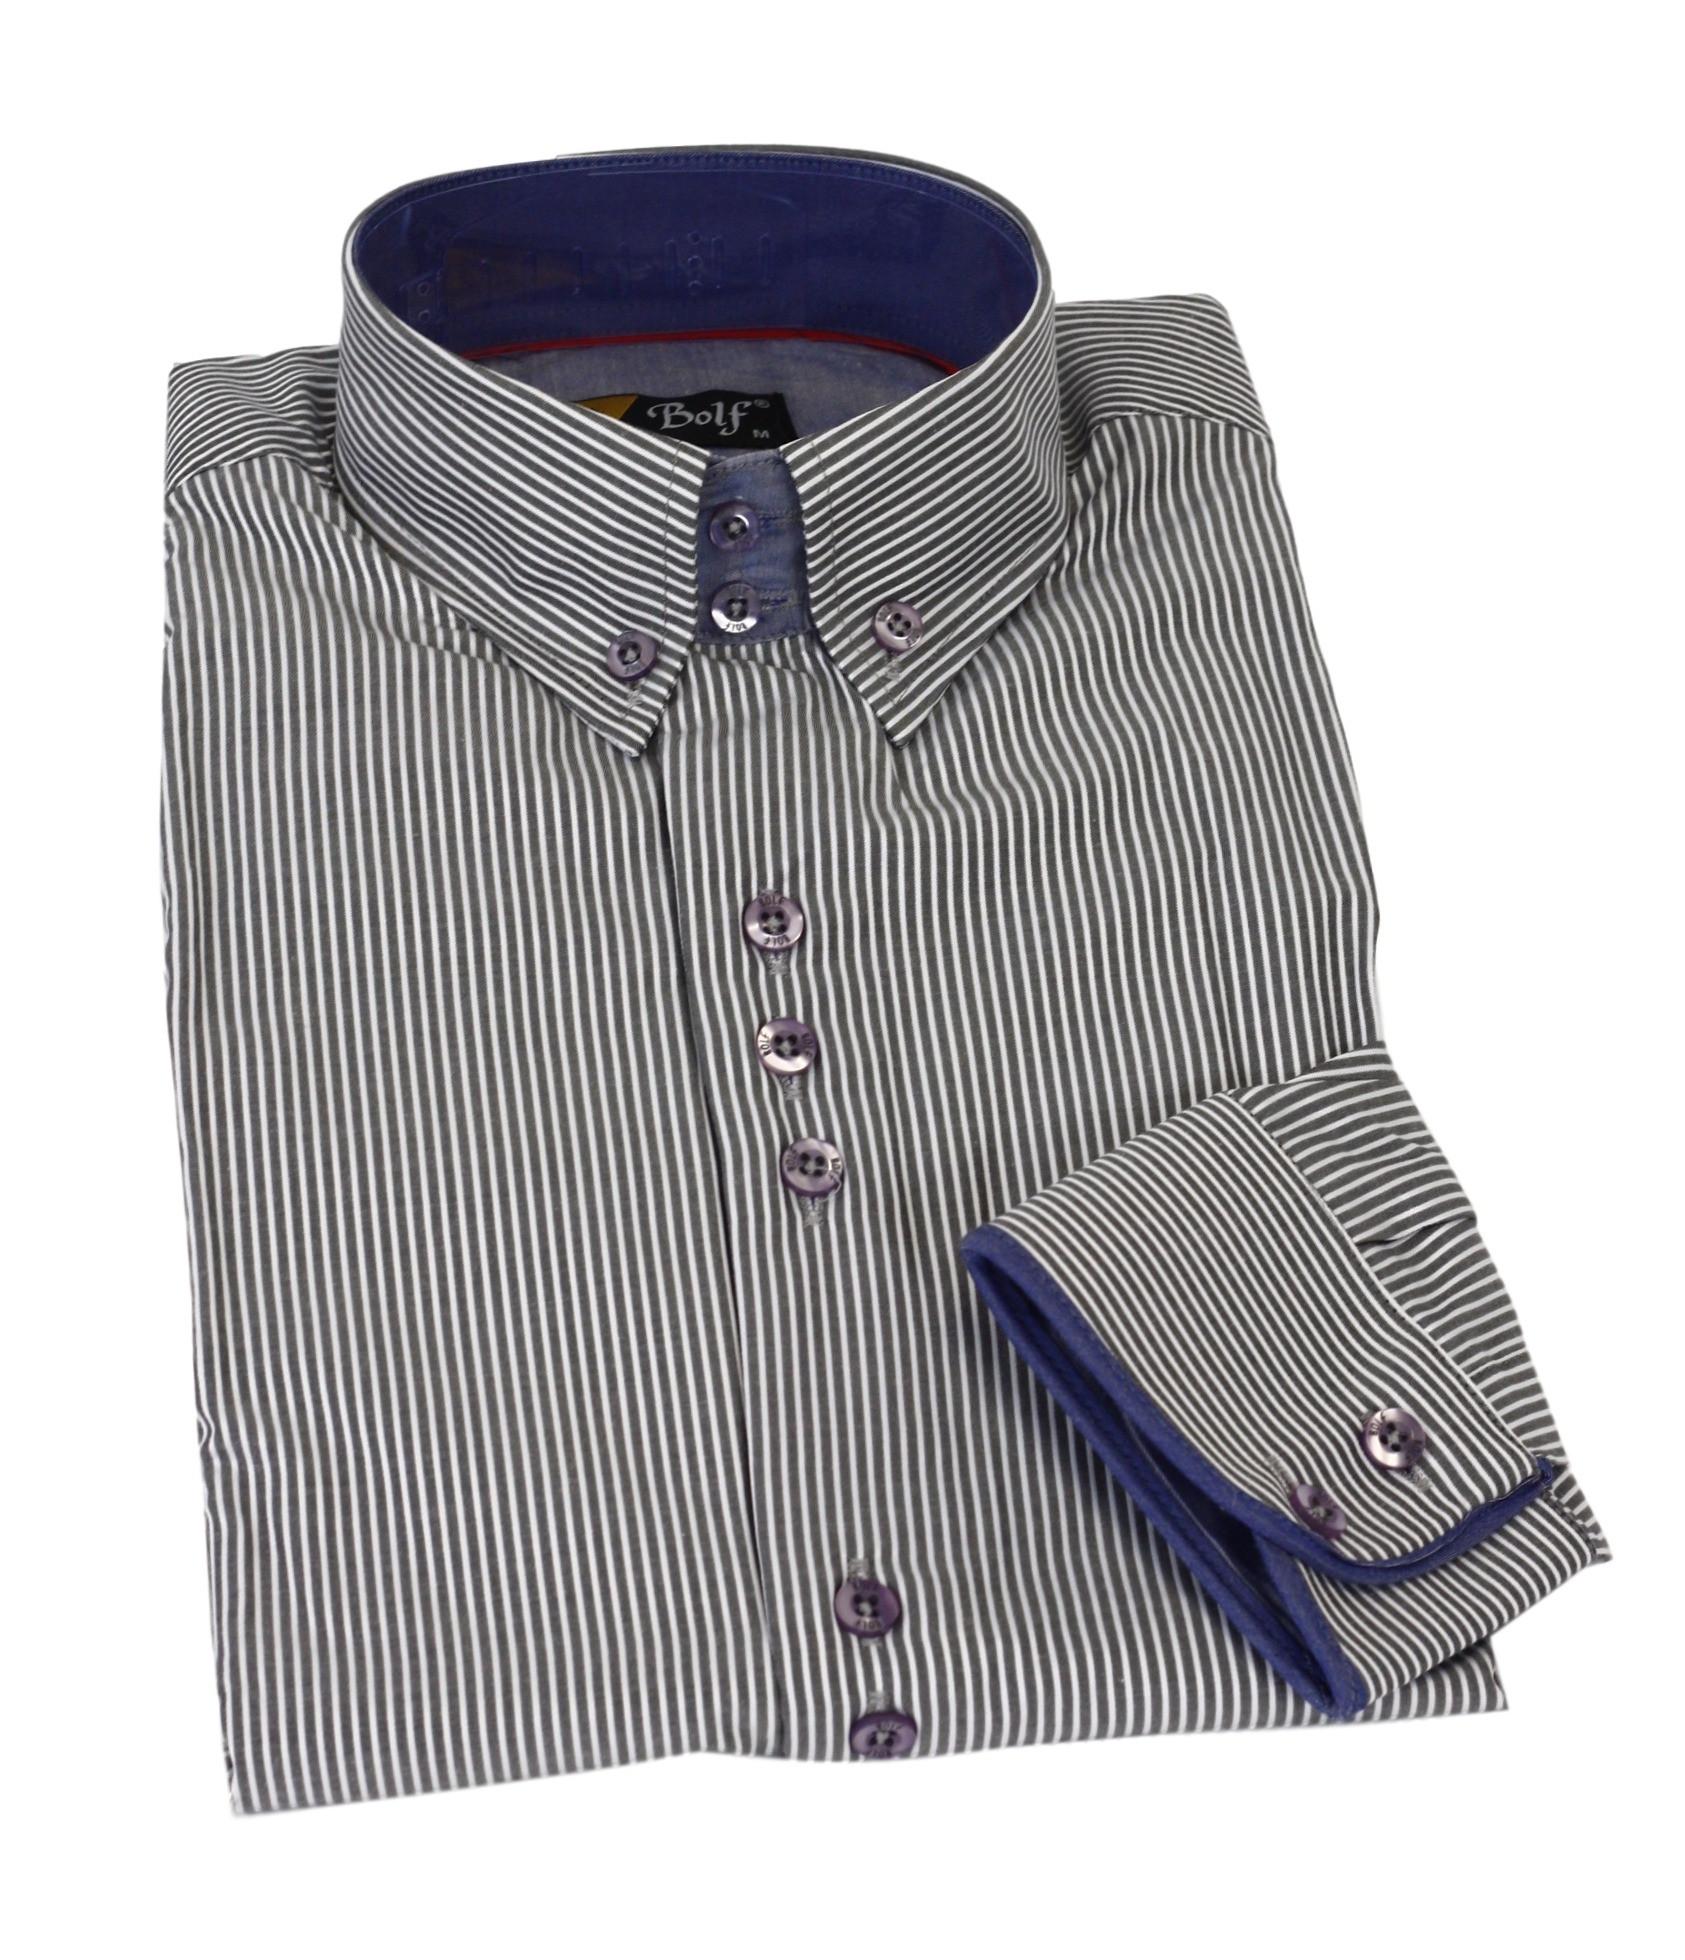 Pánská košile 2014789 - Bolf Barva: modro-bílá, Velikost: M